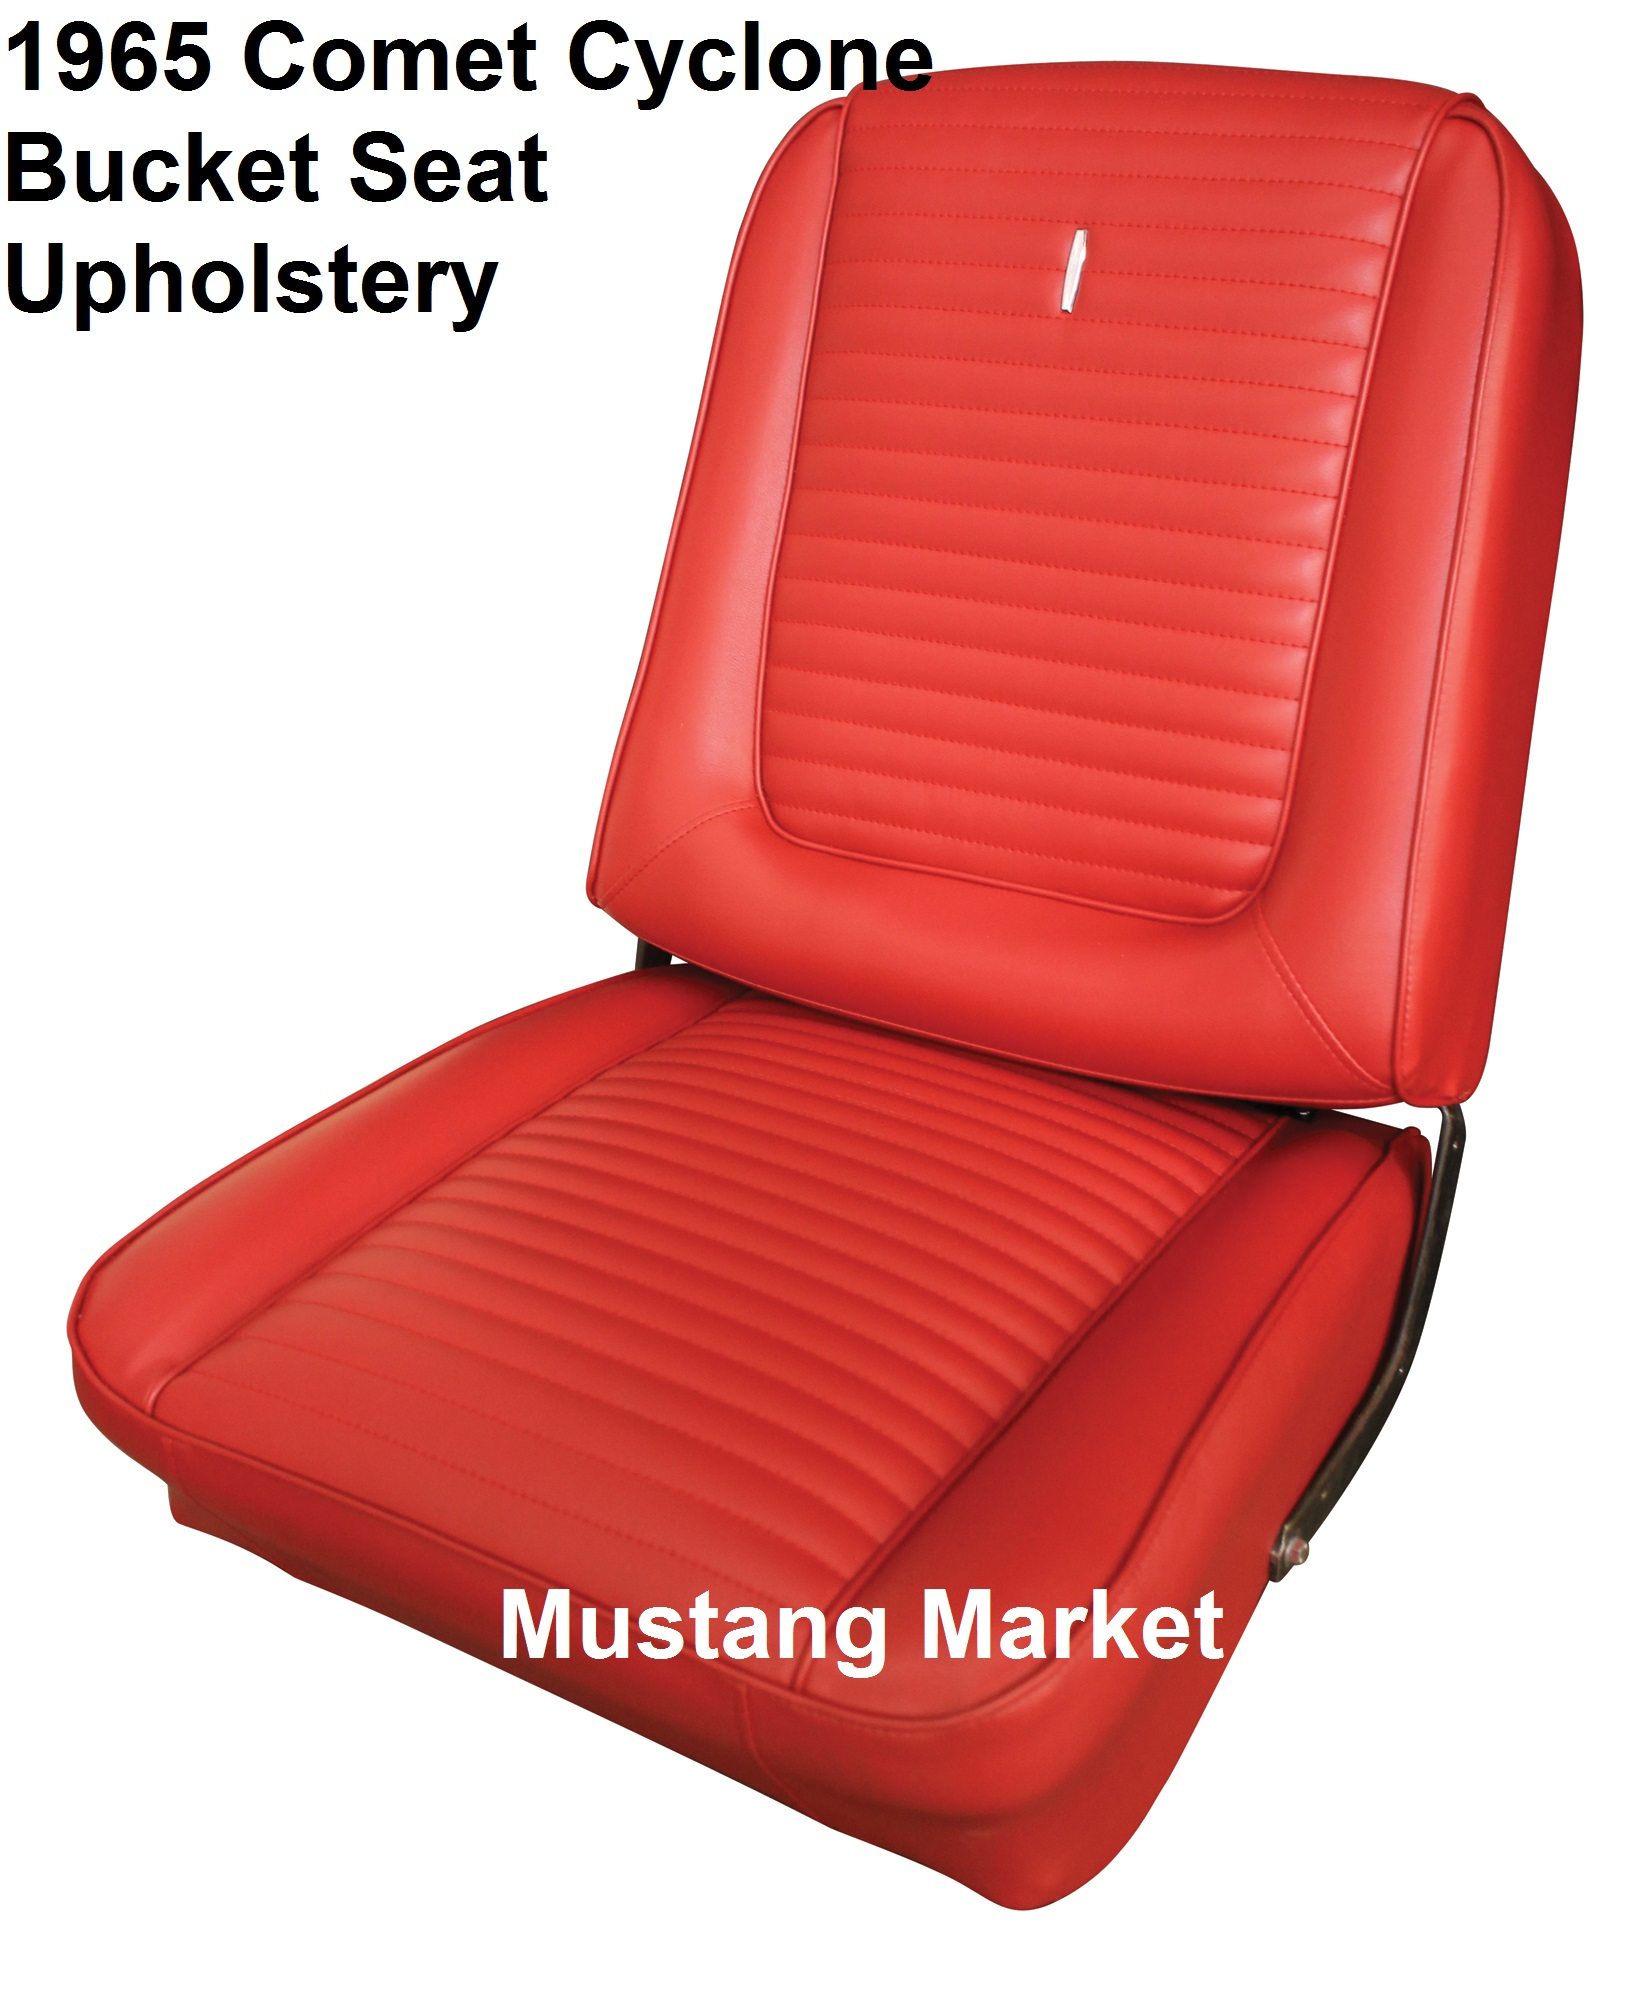 1965 Comet Cyclone Bucket Seat Upholstery